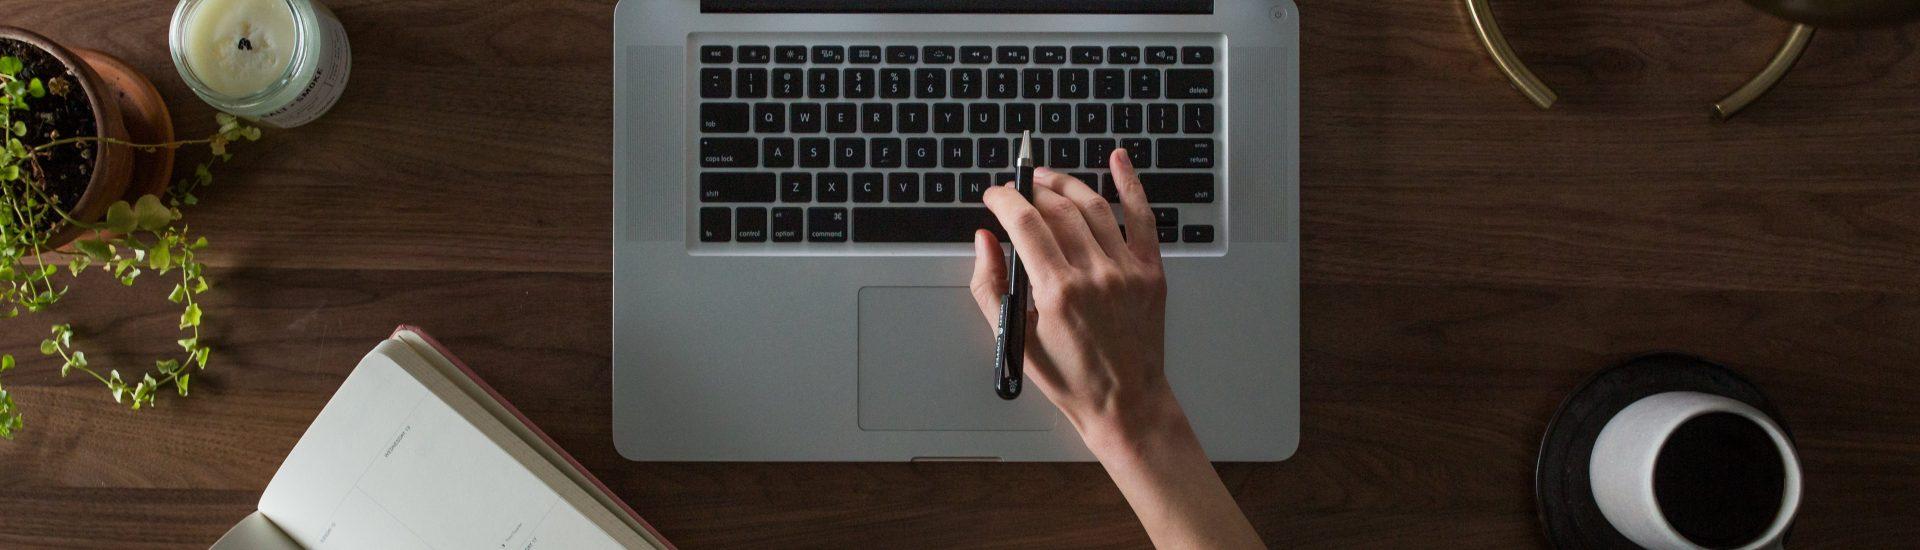 Perfekte Blogbeiträge